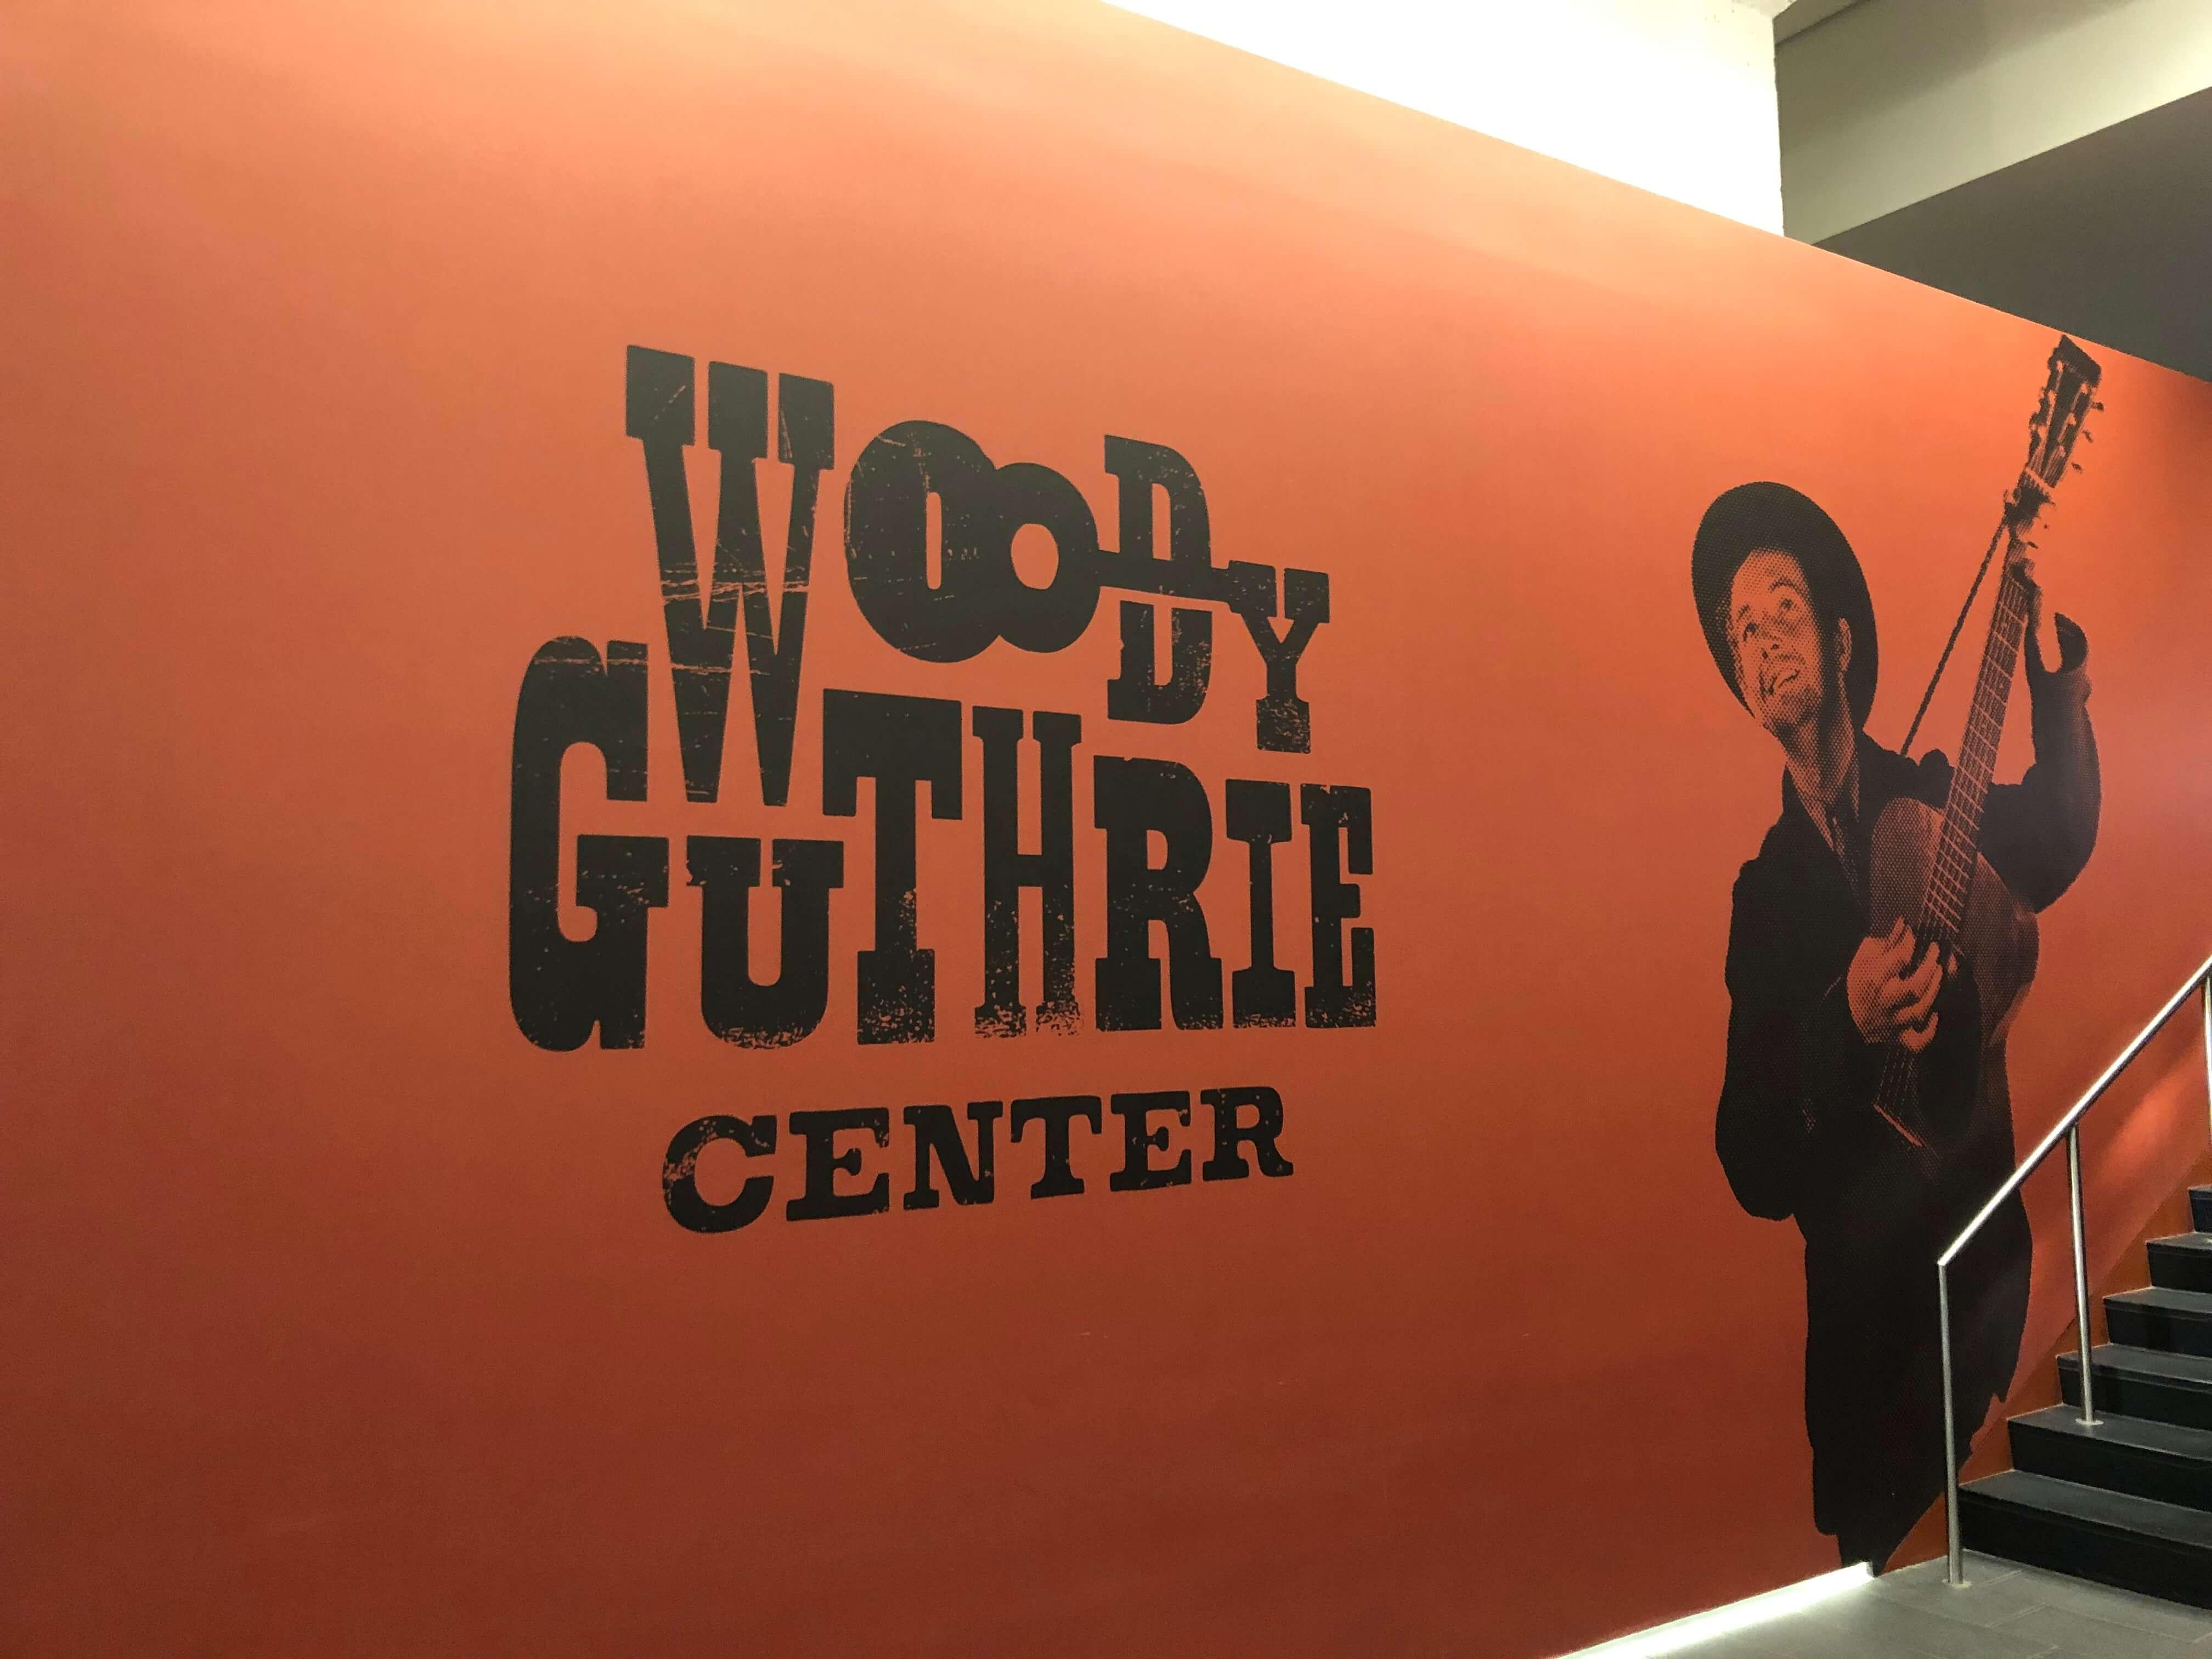 Woody Guthrie Center in Tulsa, Oklahoma